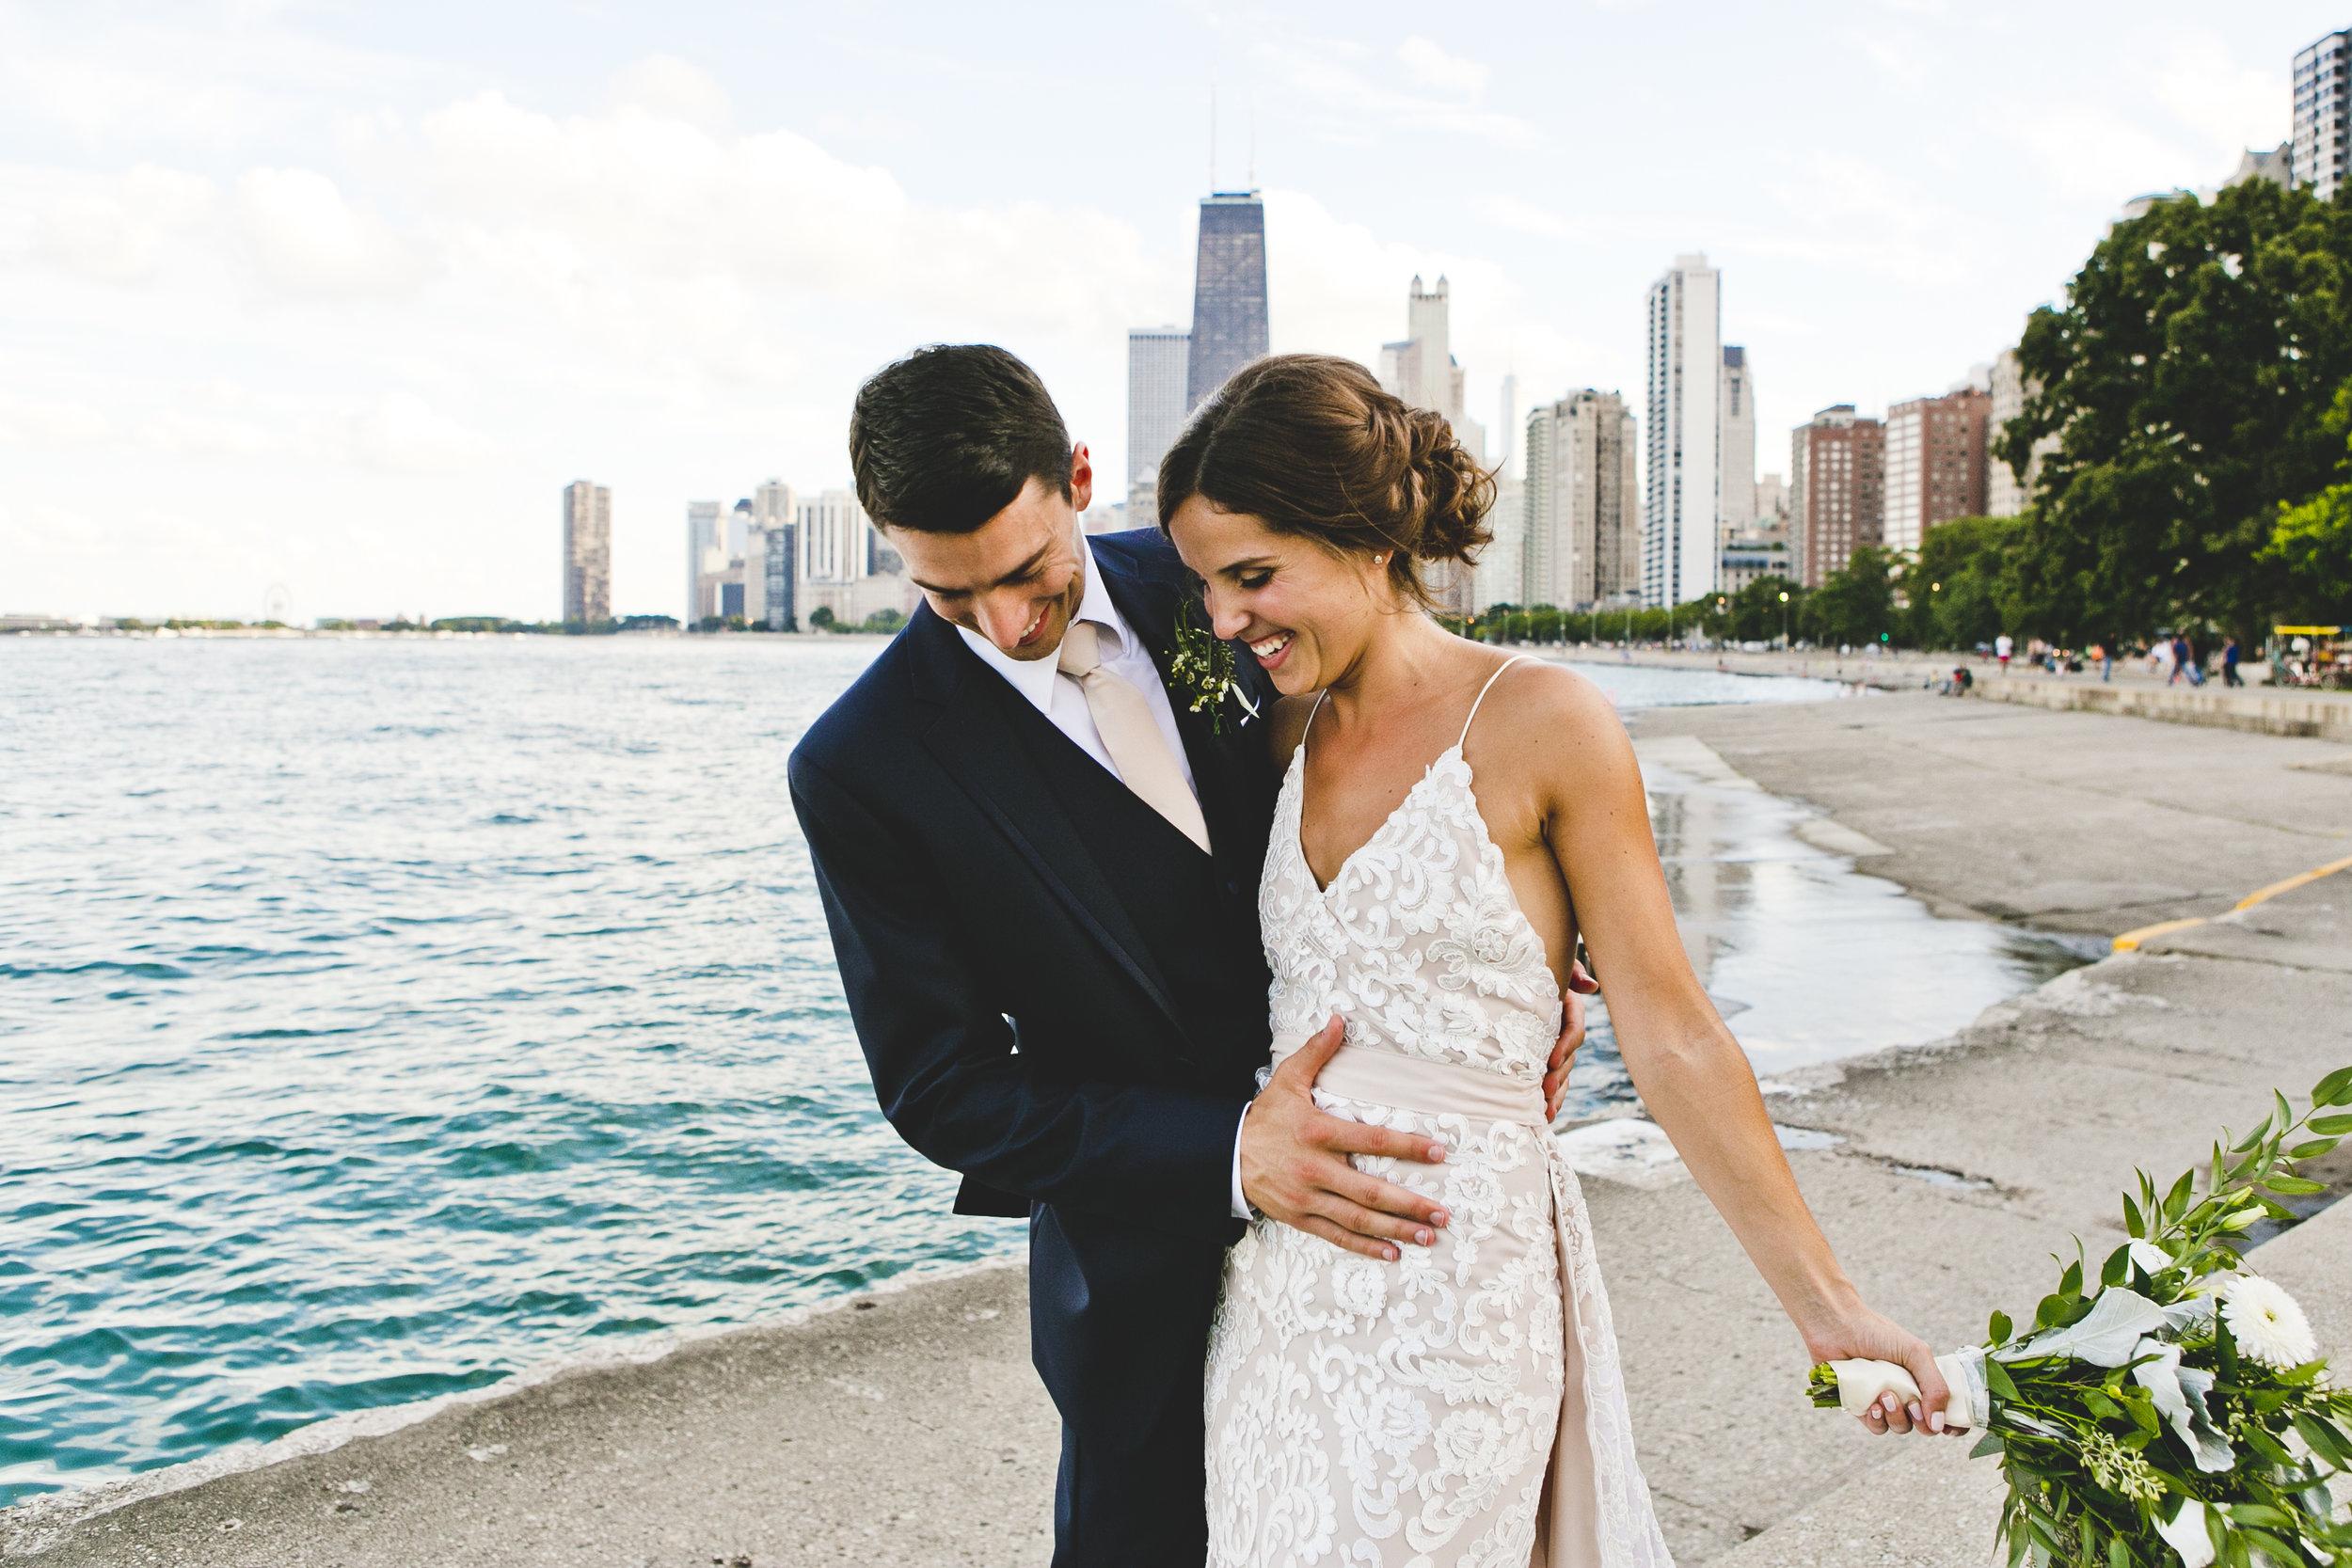 AndreaCharlie Wedding_0610.JPG